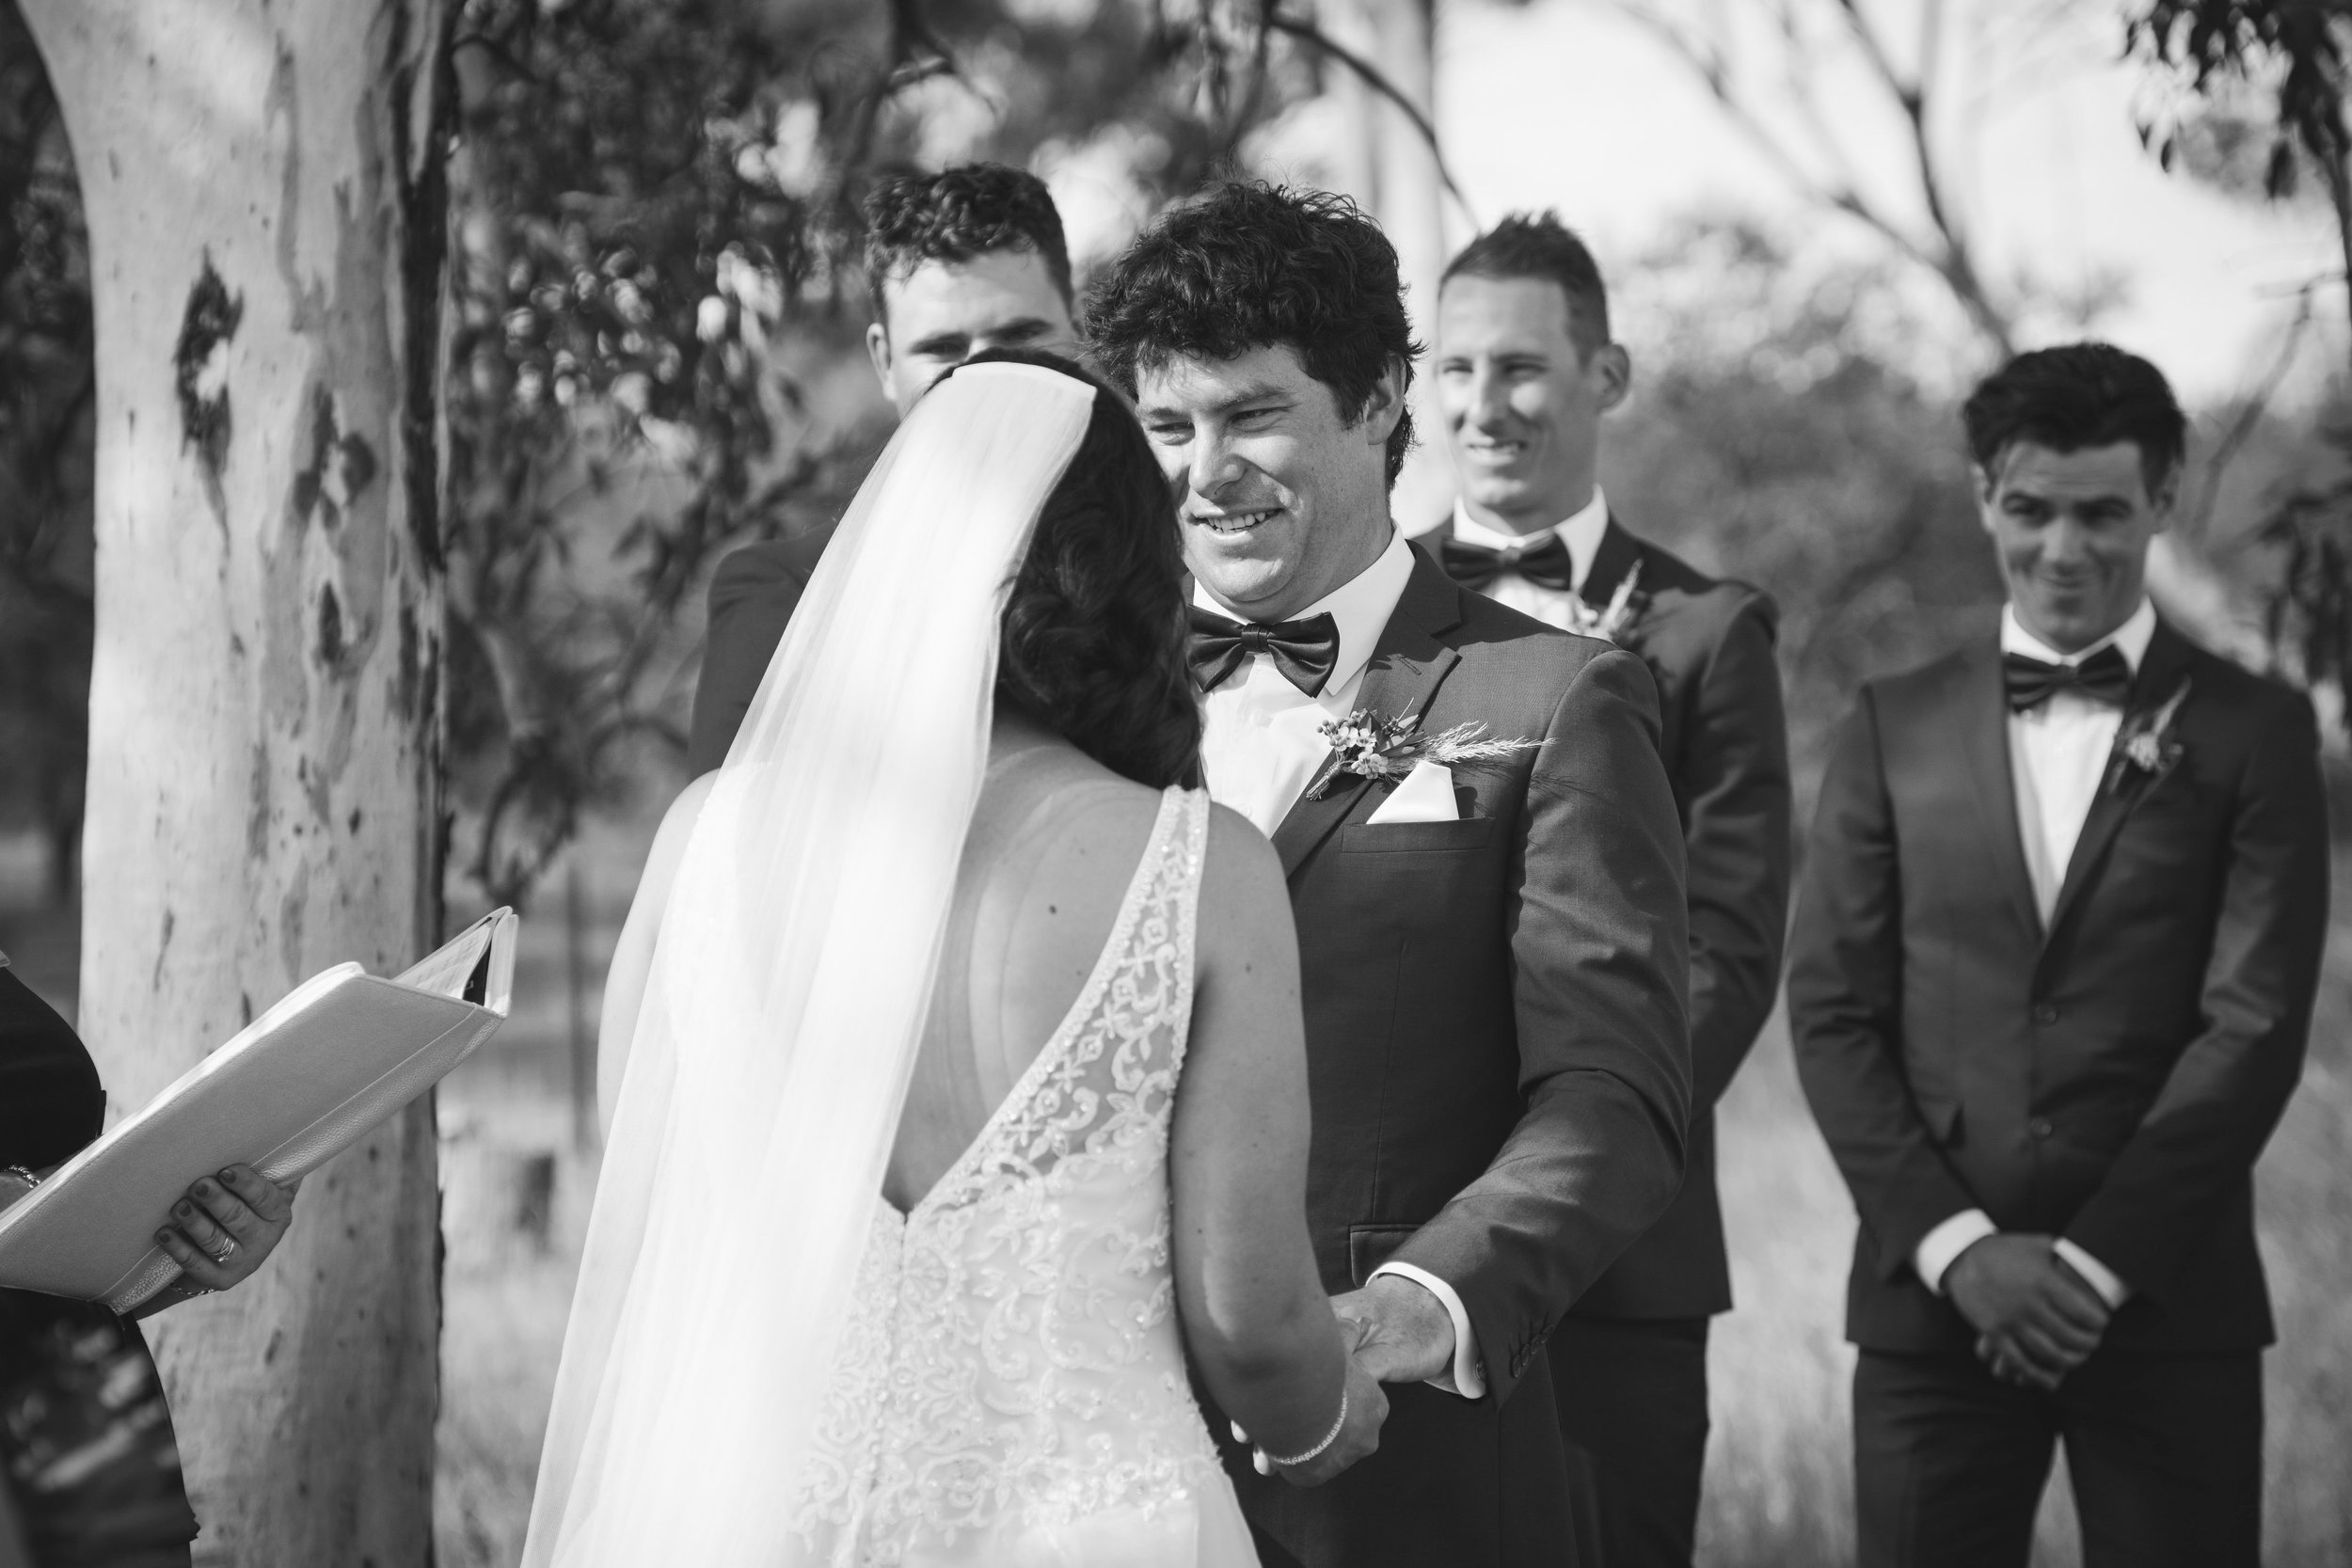 Angie Roe Photography Wheatbelt Avon Valley Farm Wedding (19).jpg